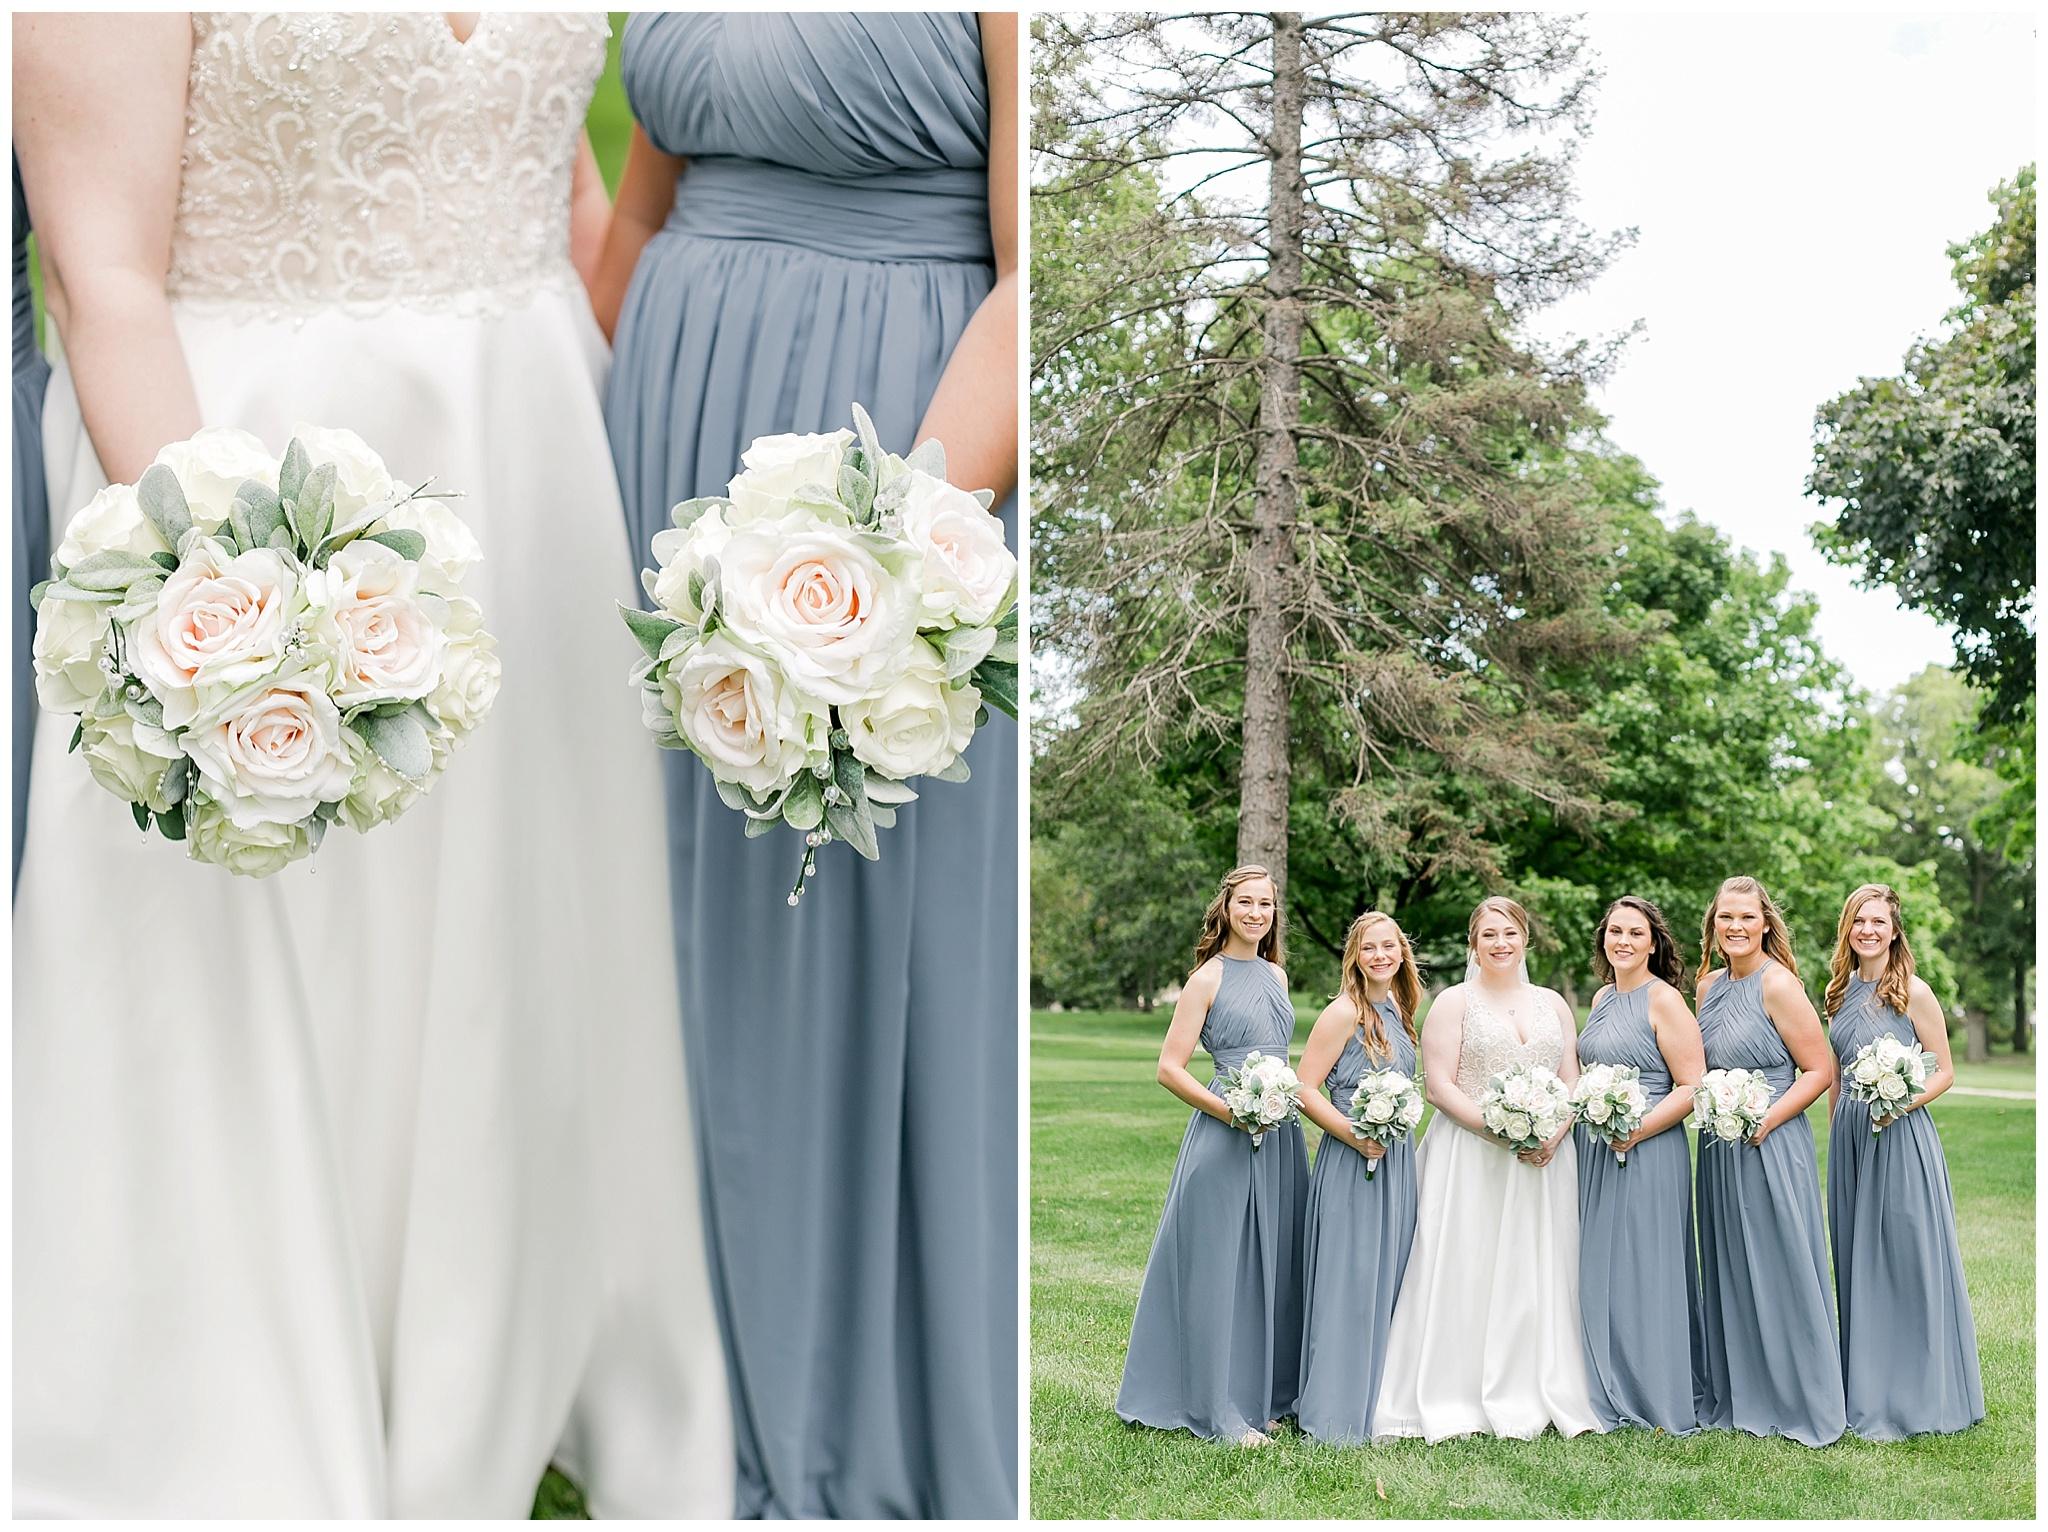 la_casa_grande_wedding_beloit_wisconsin_caynay_photo_0015.jpg